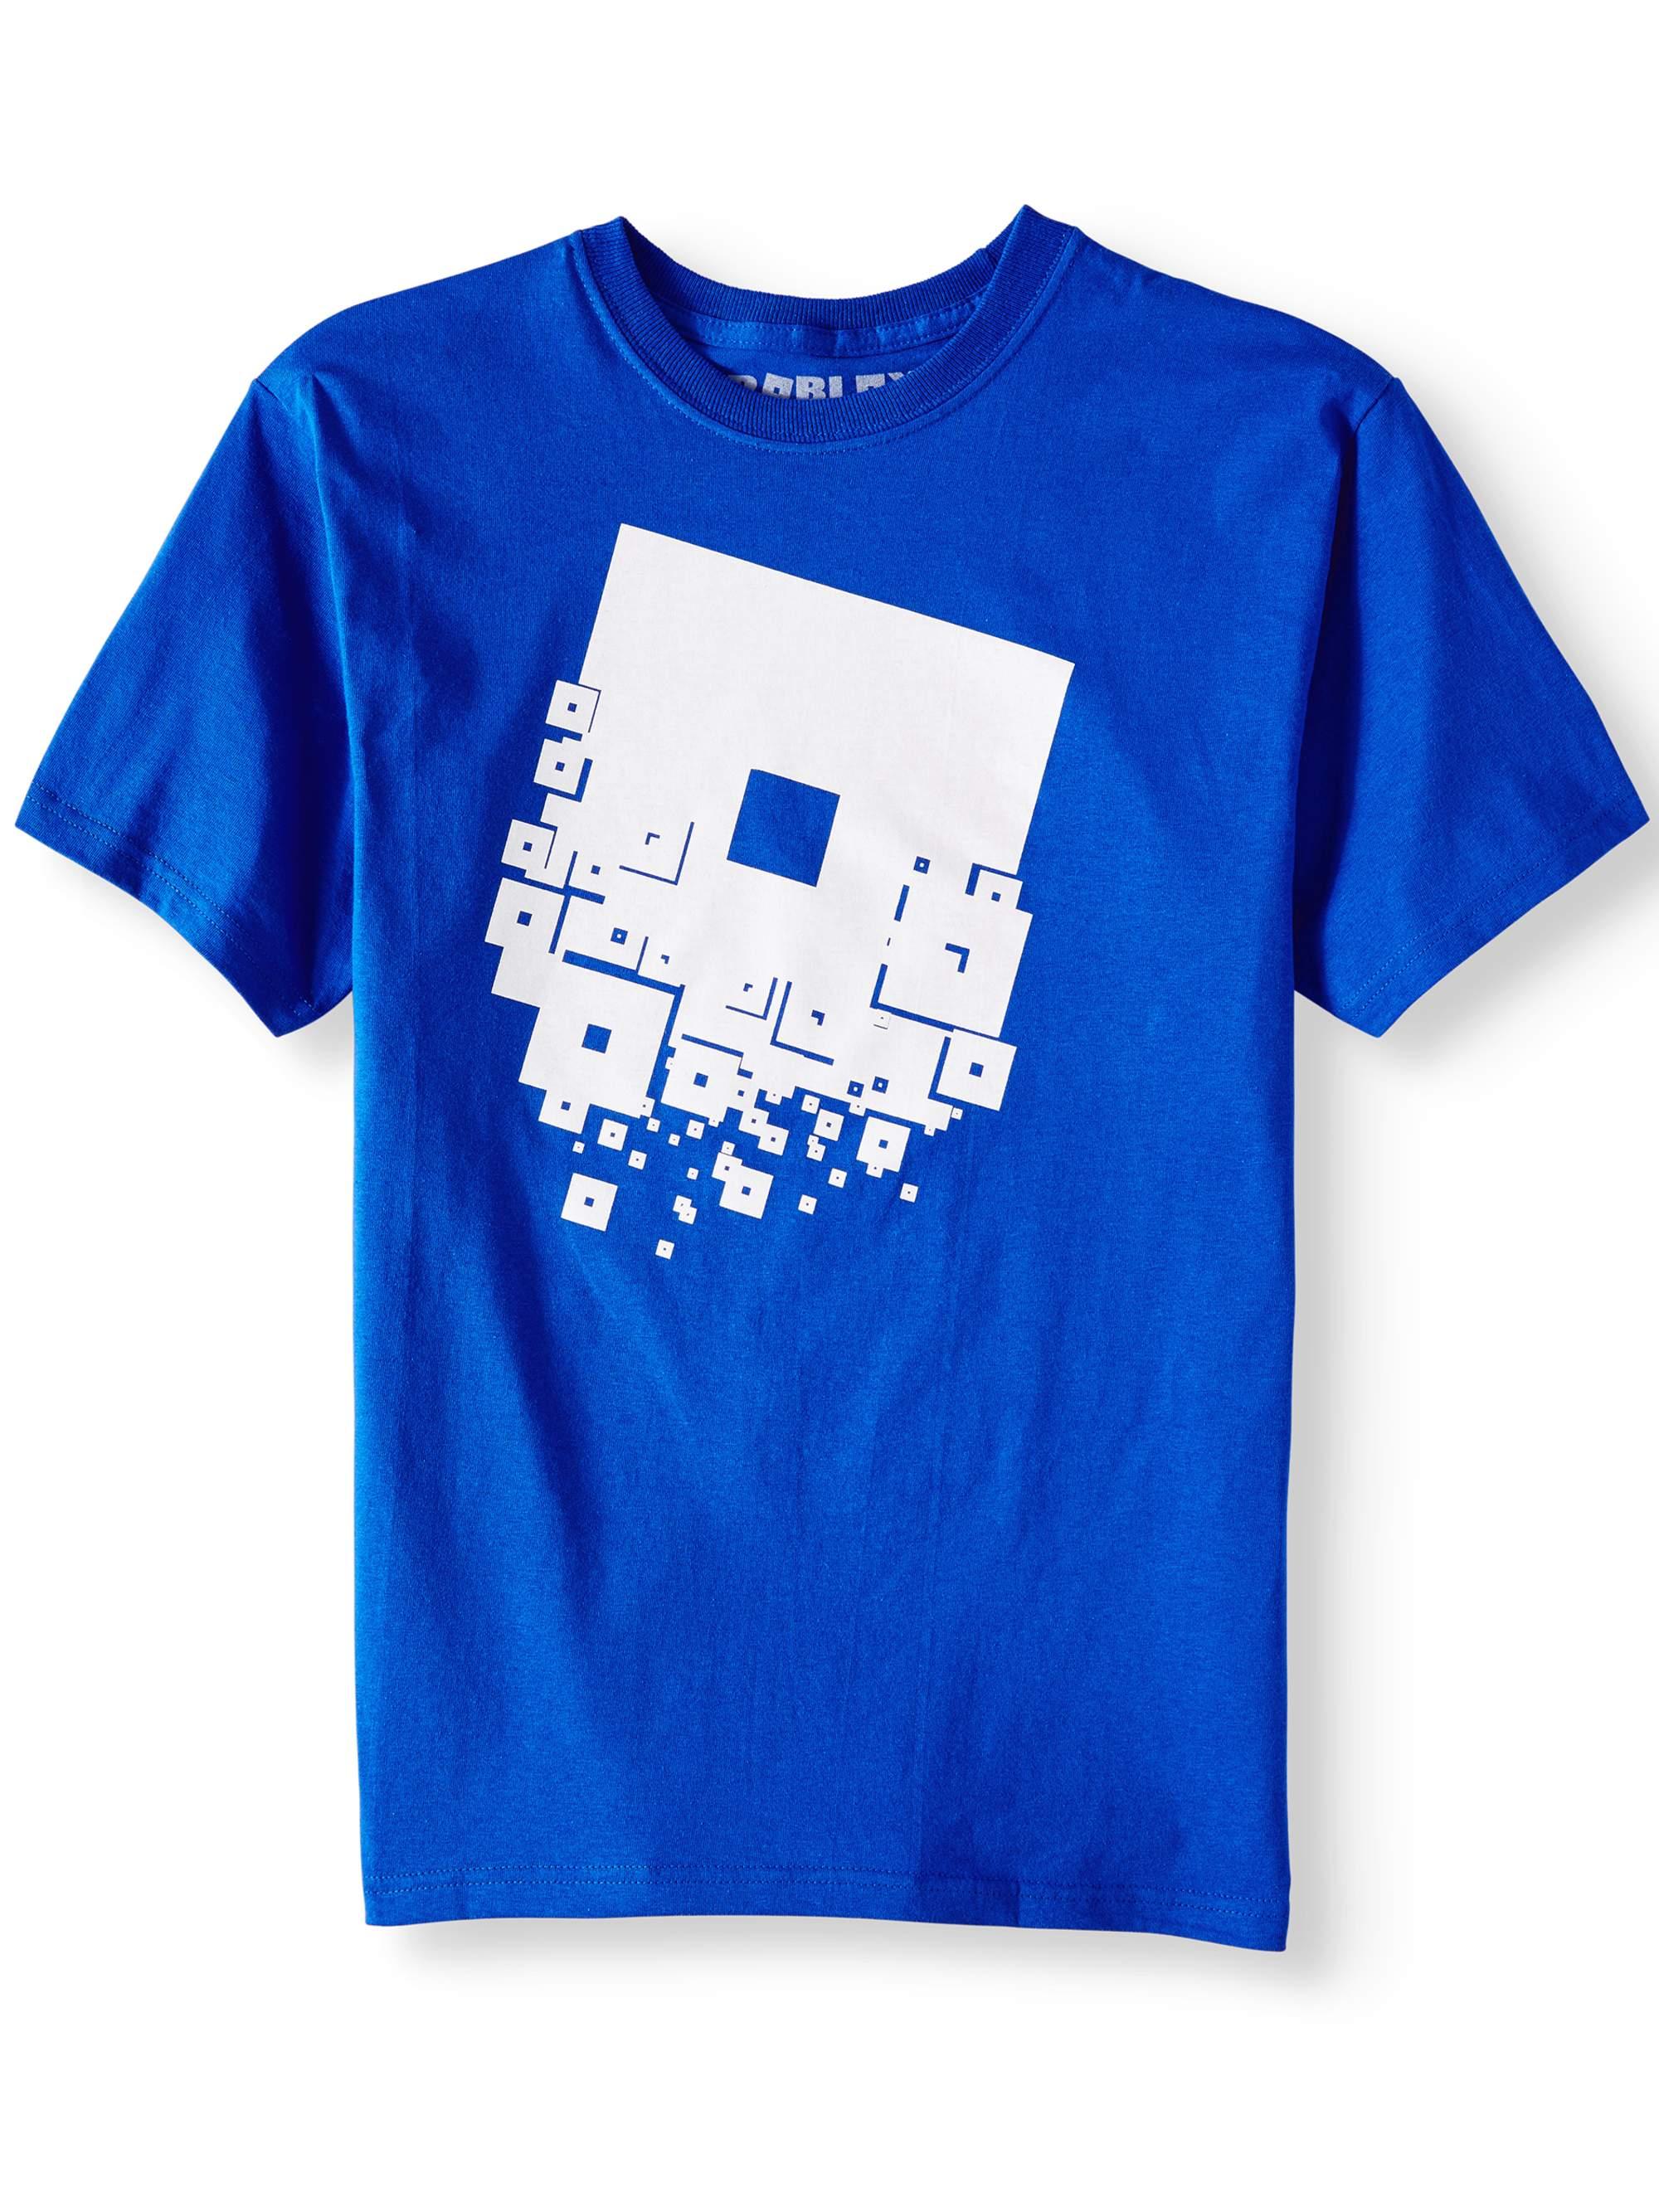 Short Sleeve Graphic T-shirts, 2-Pack Set (Little Boys & Big Boys)